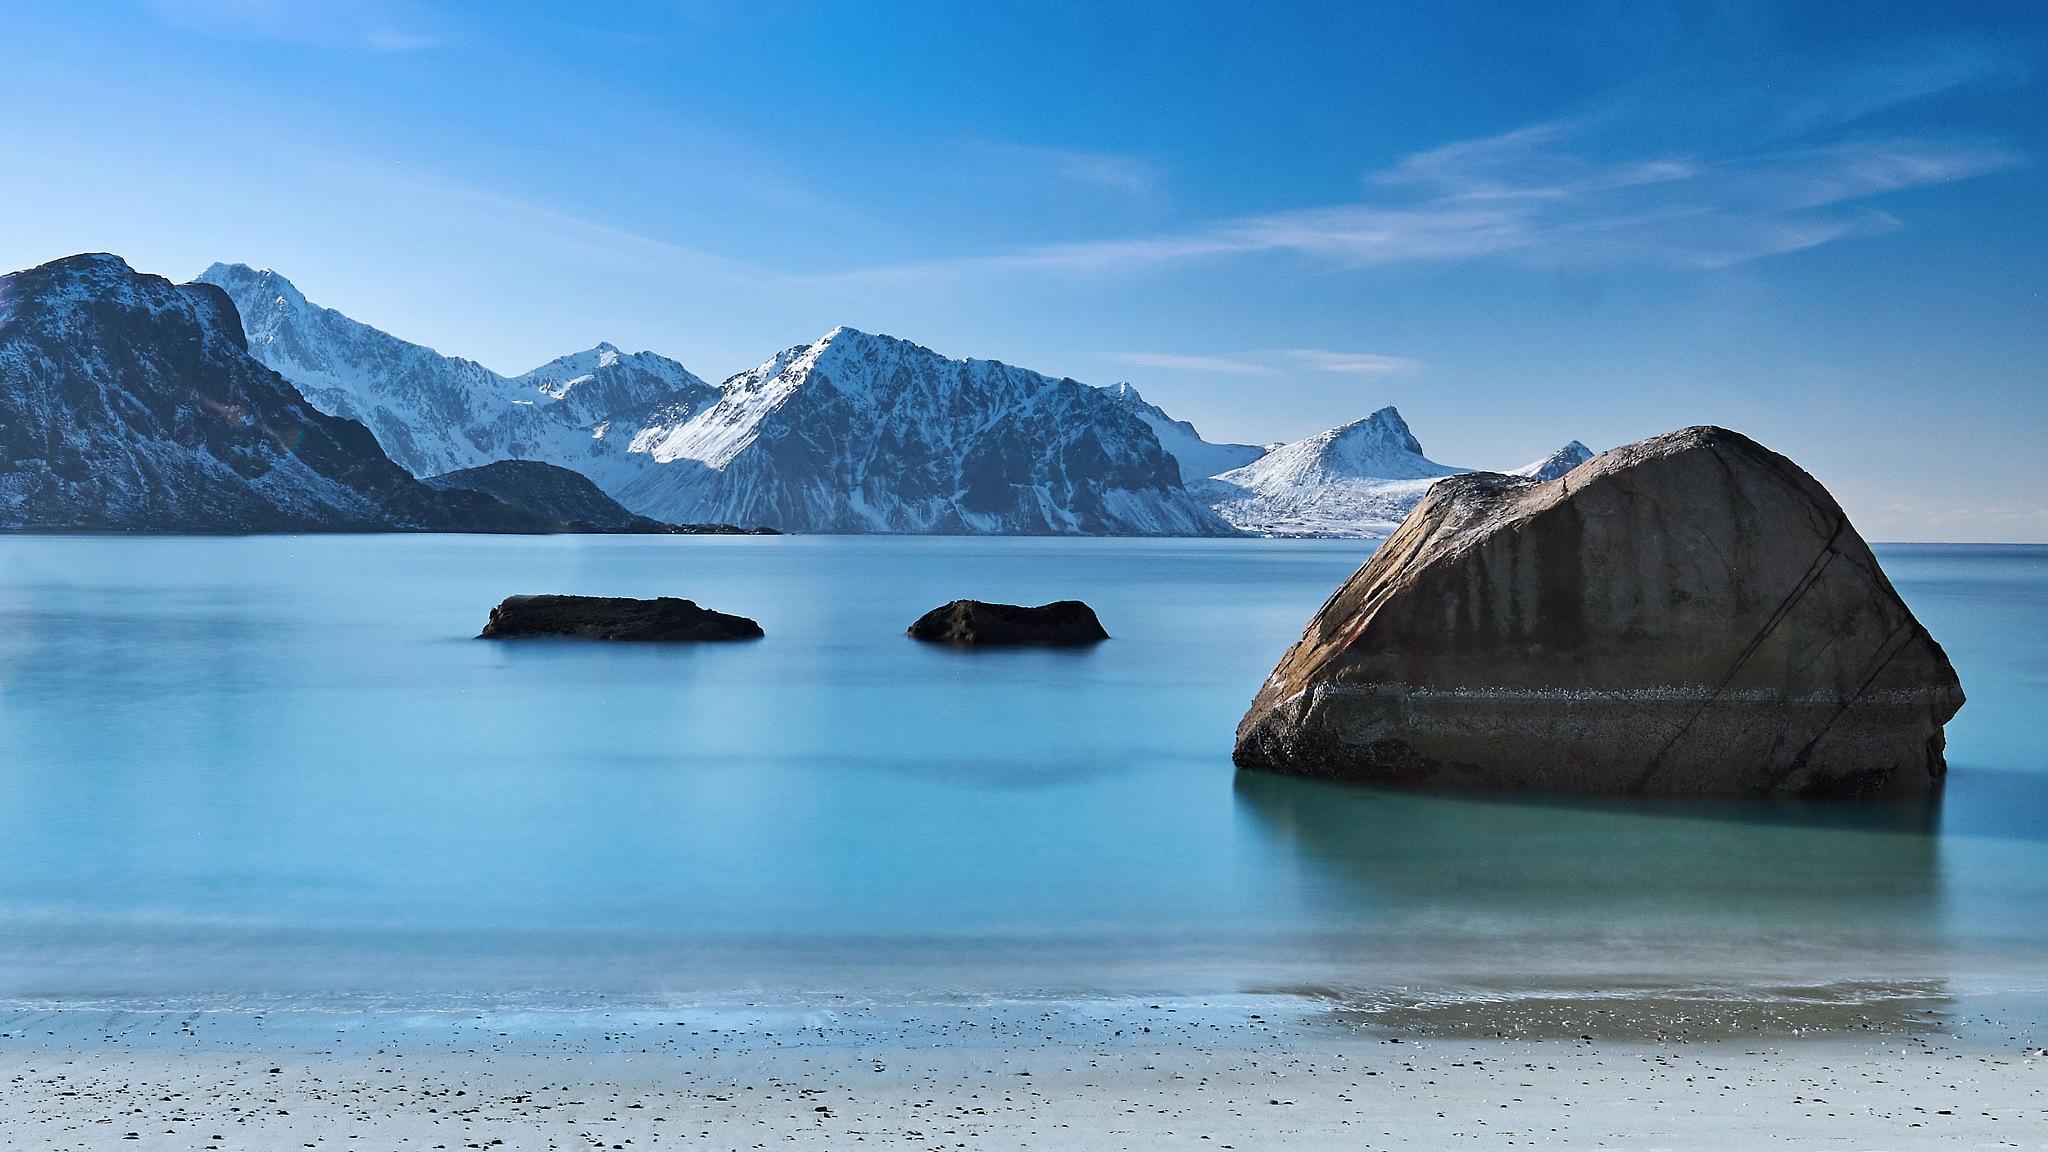 Beach at the Lofoten by Hakan Cacharel